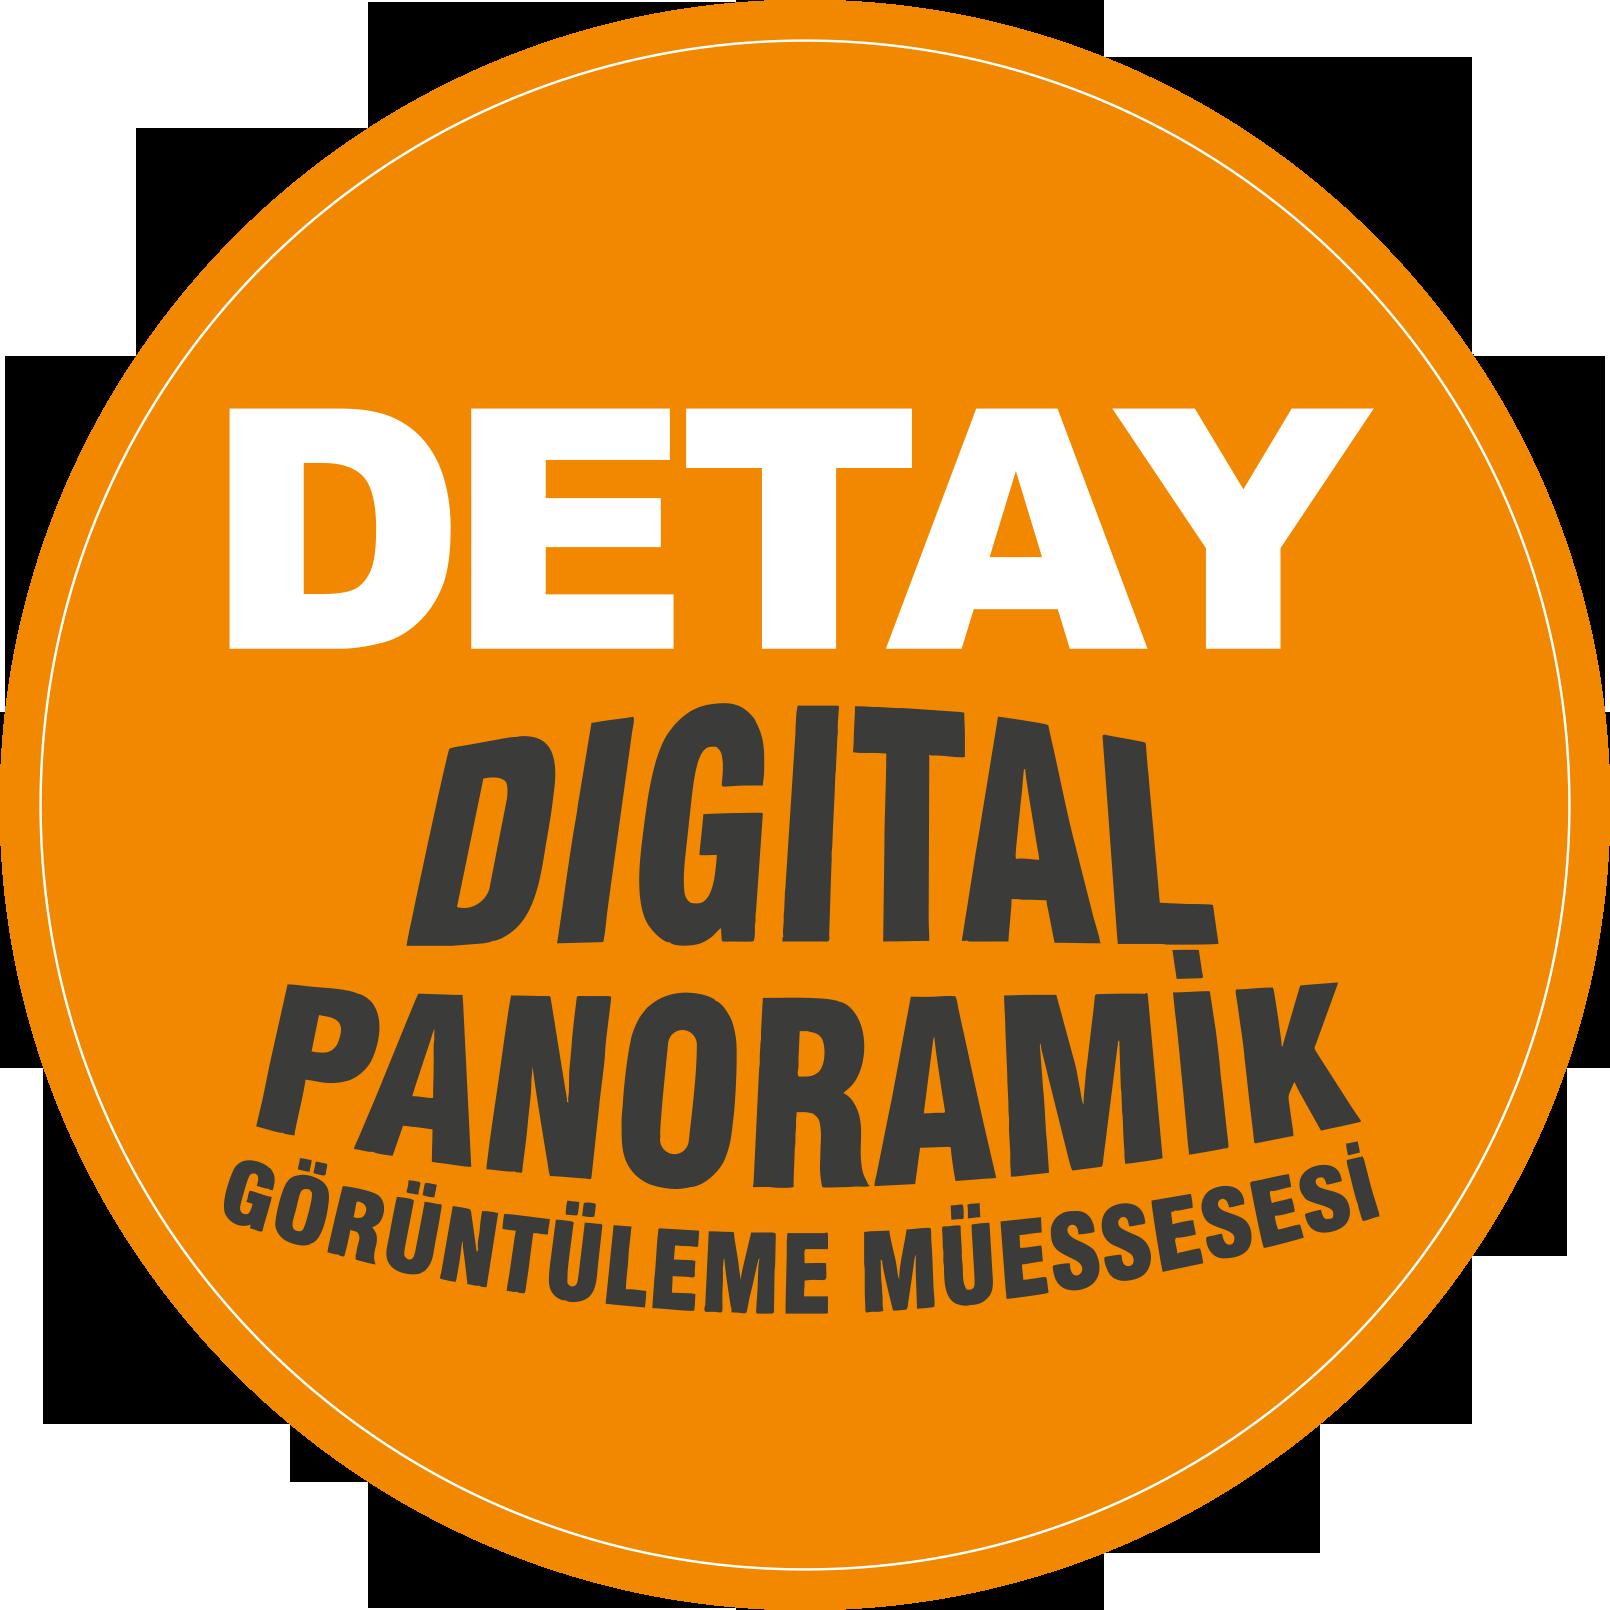 Panoramik Film, Dental Tomografi,Çene Filmi, Diş Filmi, Sefalometrik,Sub-Menatl, Anterior-Posterior,TME, Kızılay,Çankaya,Ankara